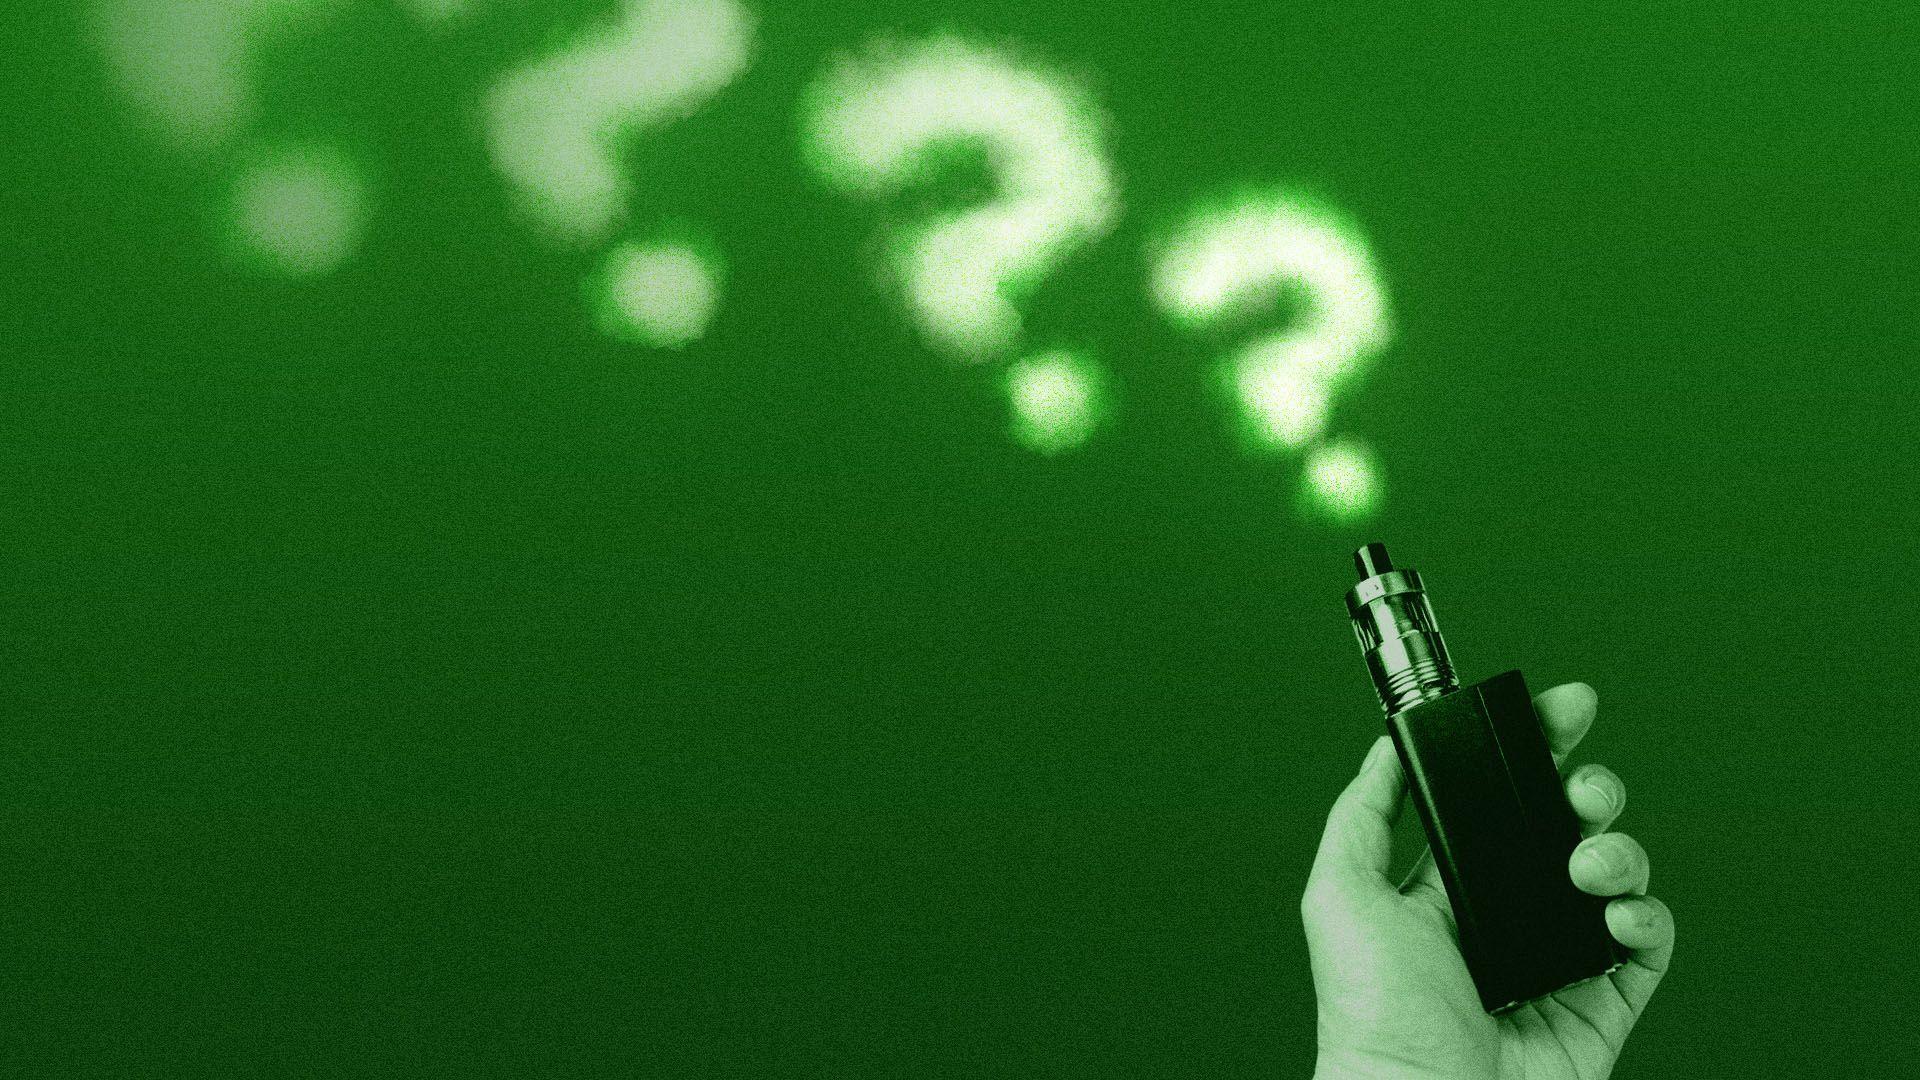 Illustration of a vape pen emitting question mark vapors